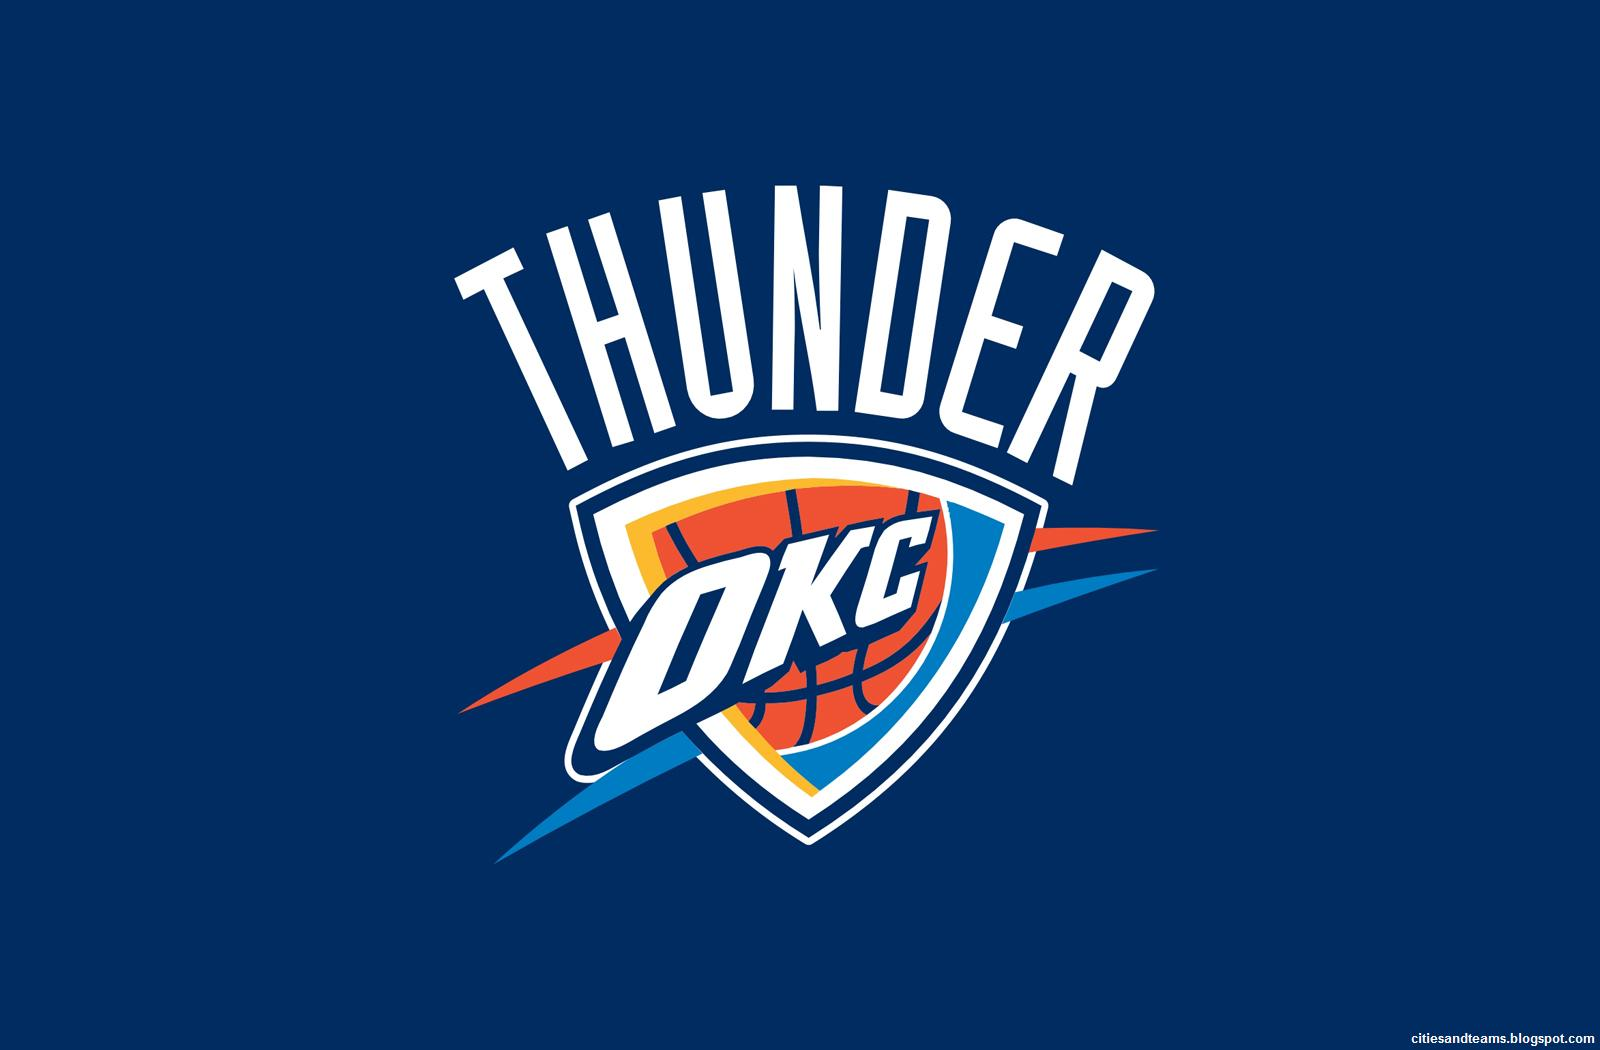 Oklahoma City Thunder NBA 2012 Finalist OKC Logo HD Desktop Wallpaper 1600x1050